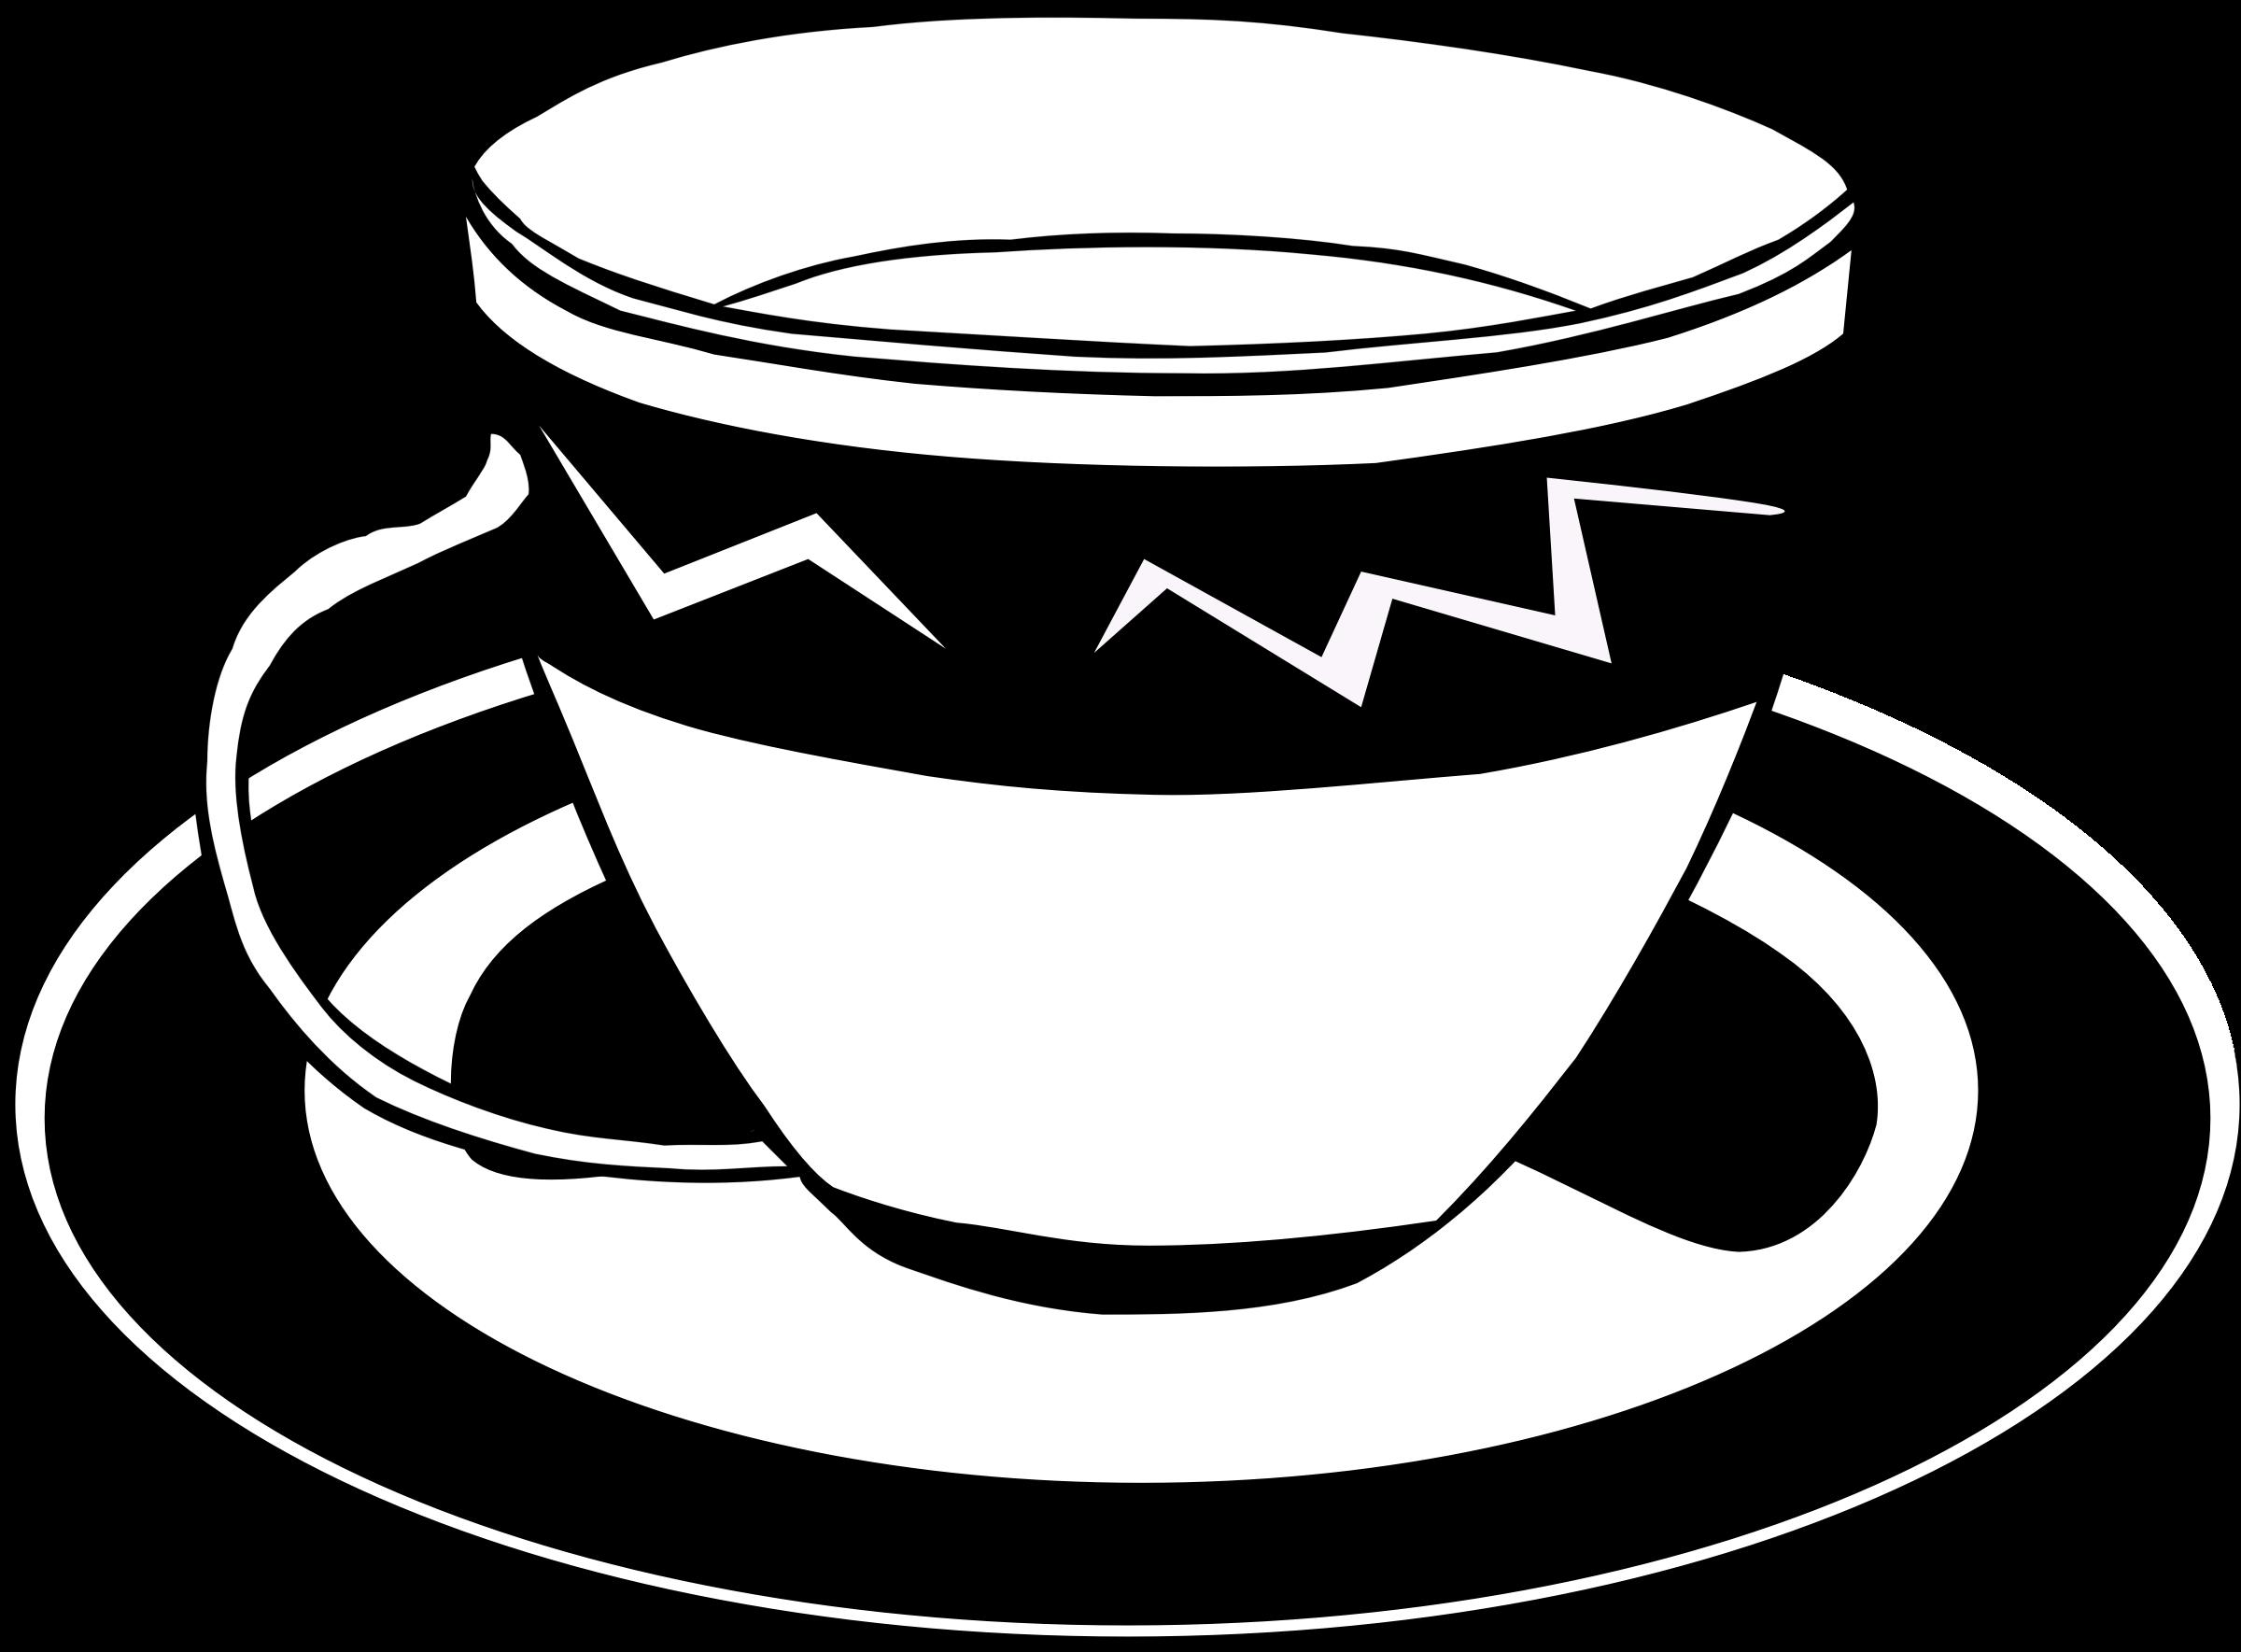 Fast food drinks tea. Politics clipart election